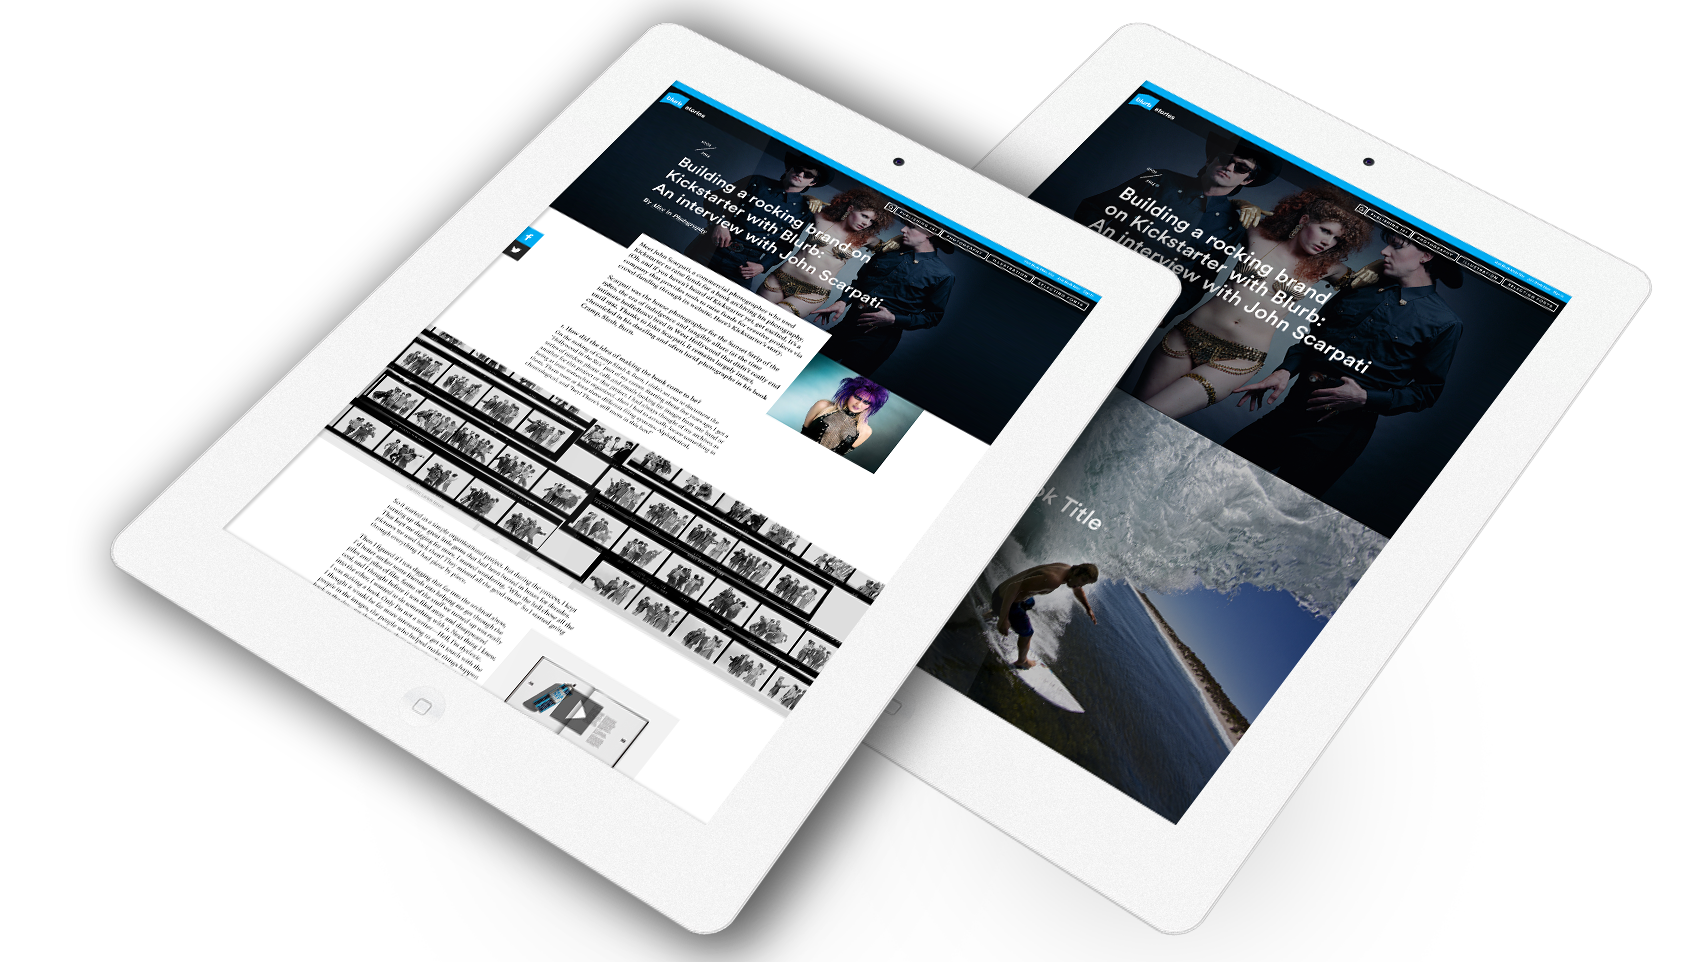 blurb-propane-studios-app